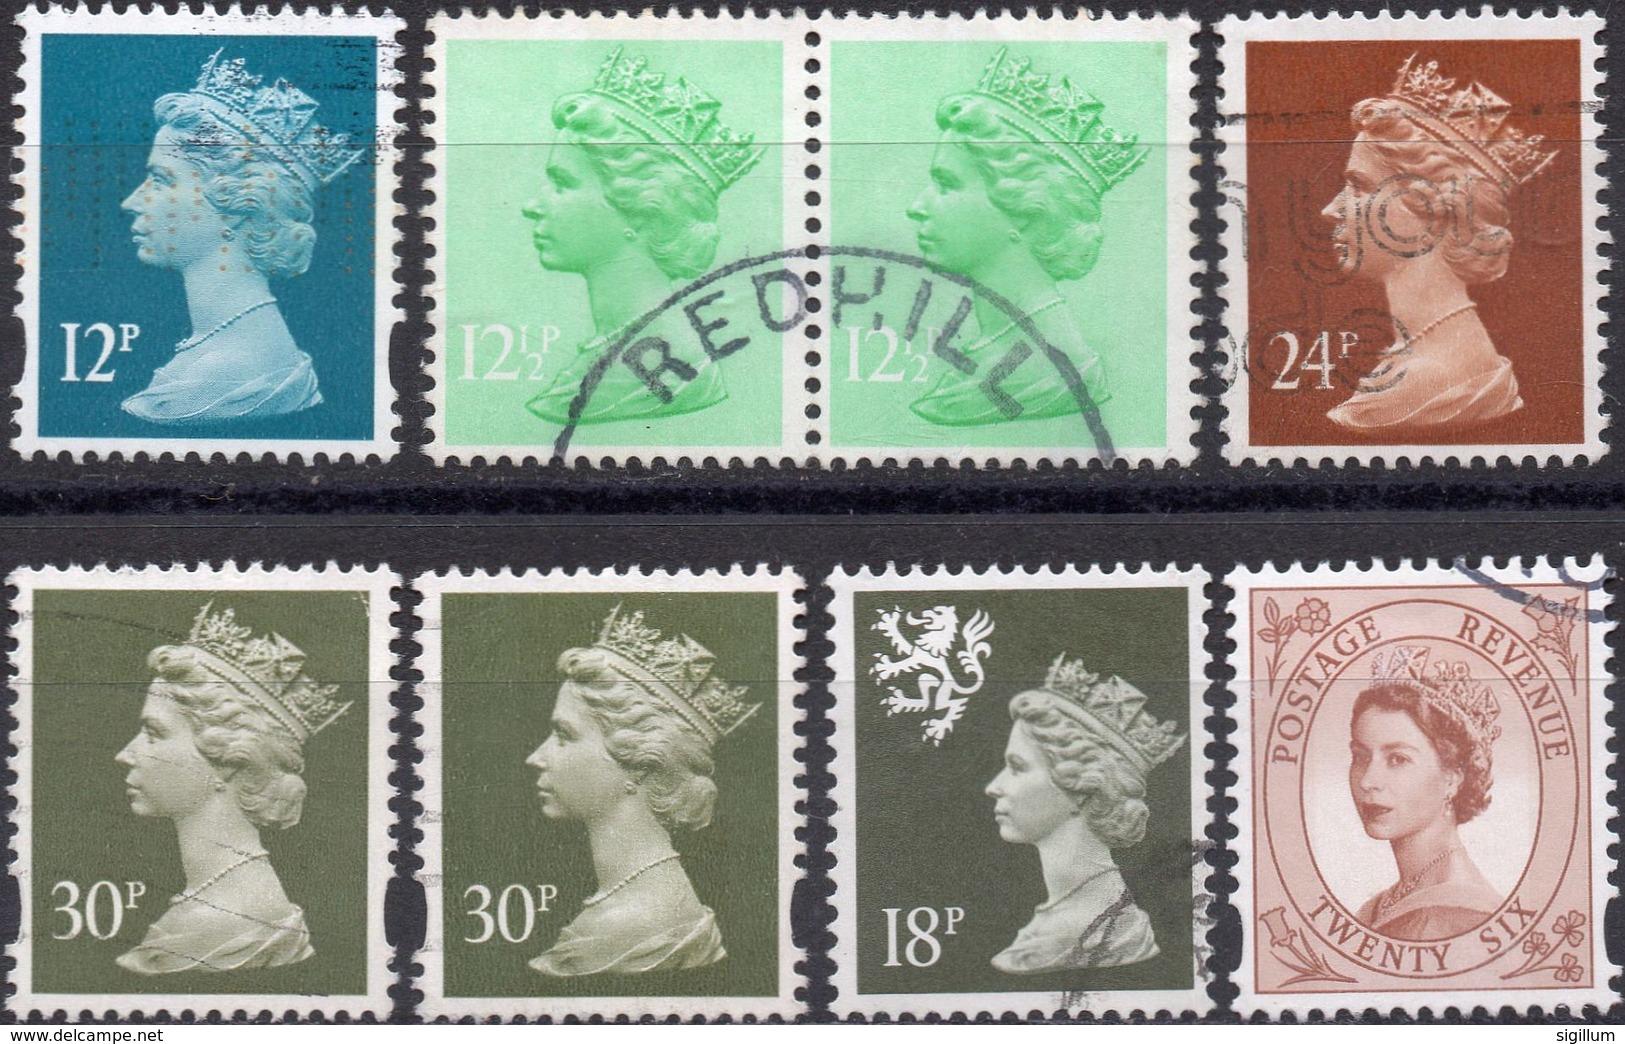 GRAN BRETAGNA 1971/2006 - ELIZABETH II - 8 VALORI USATI - Usati